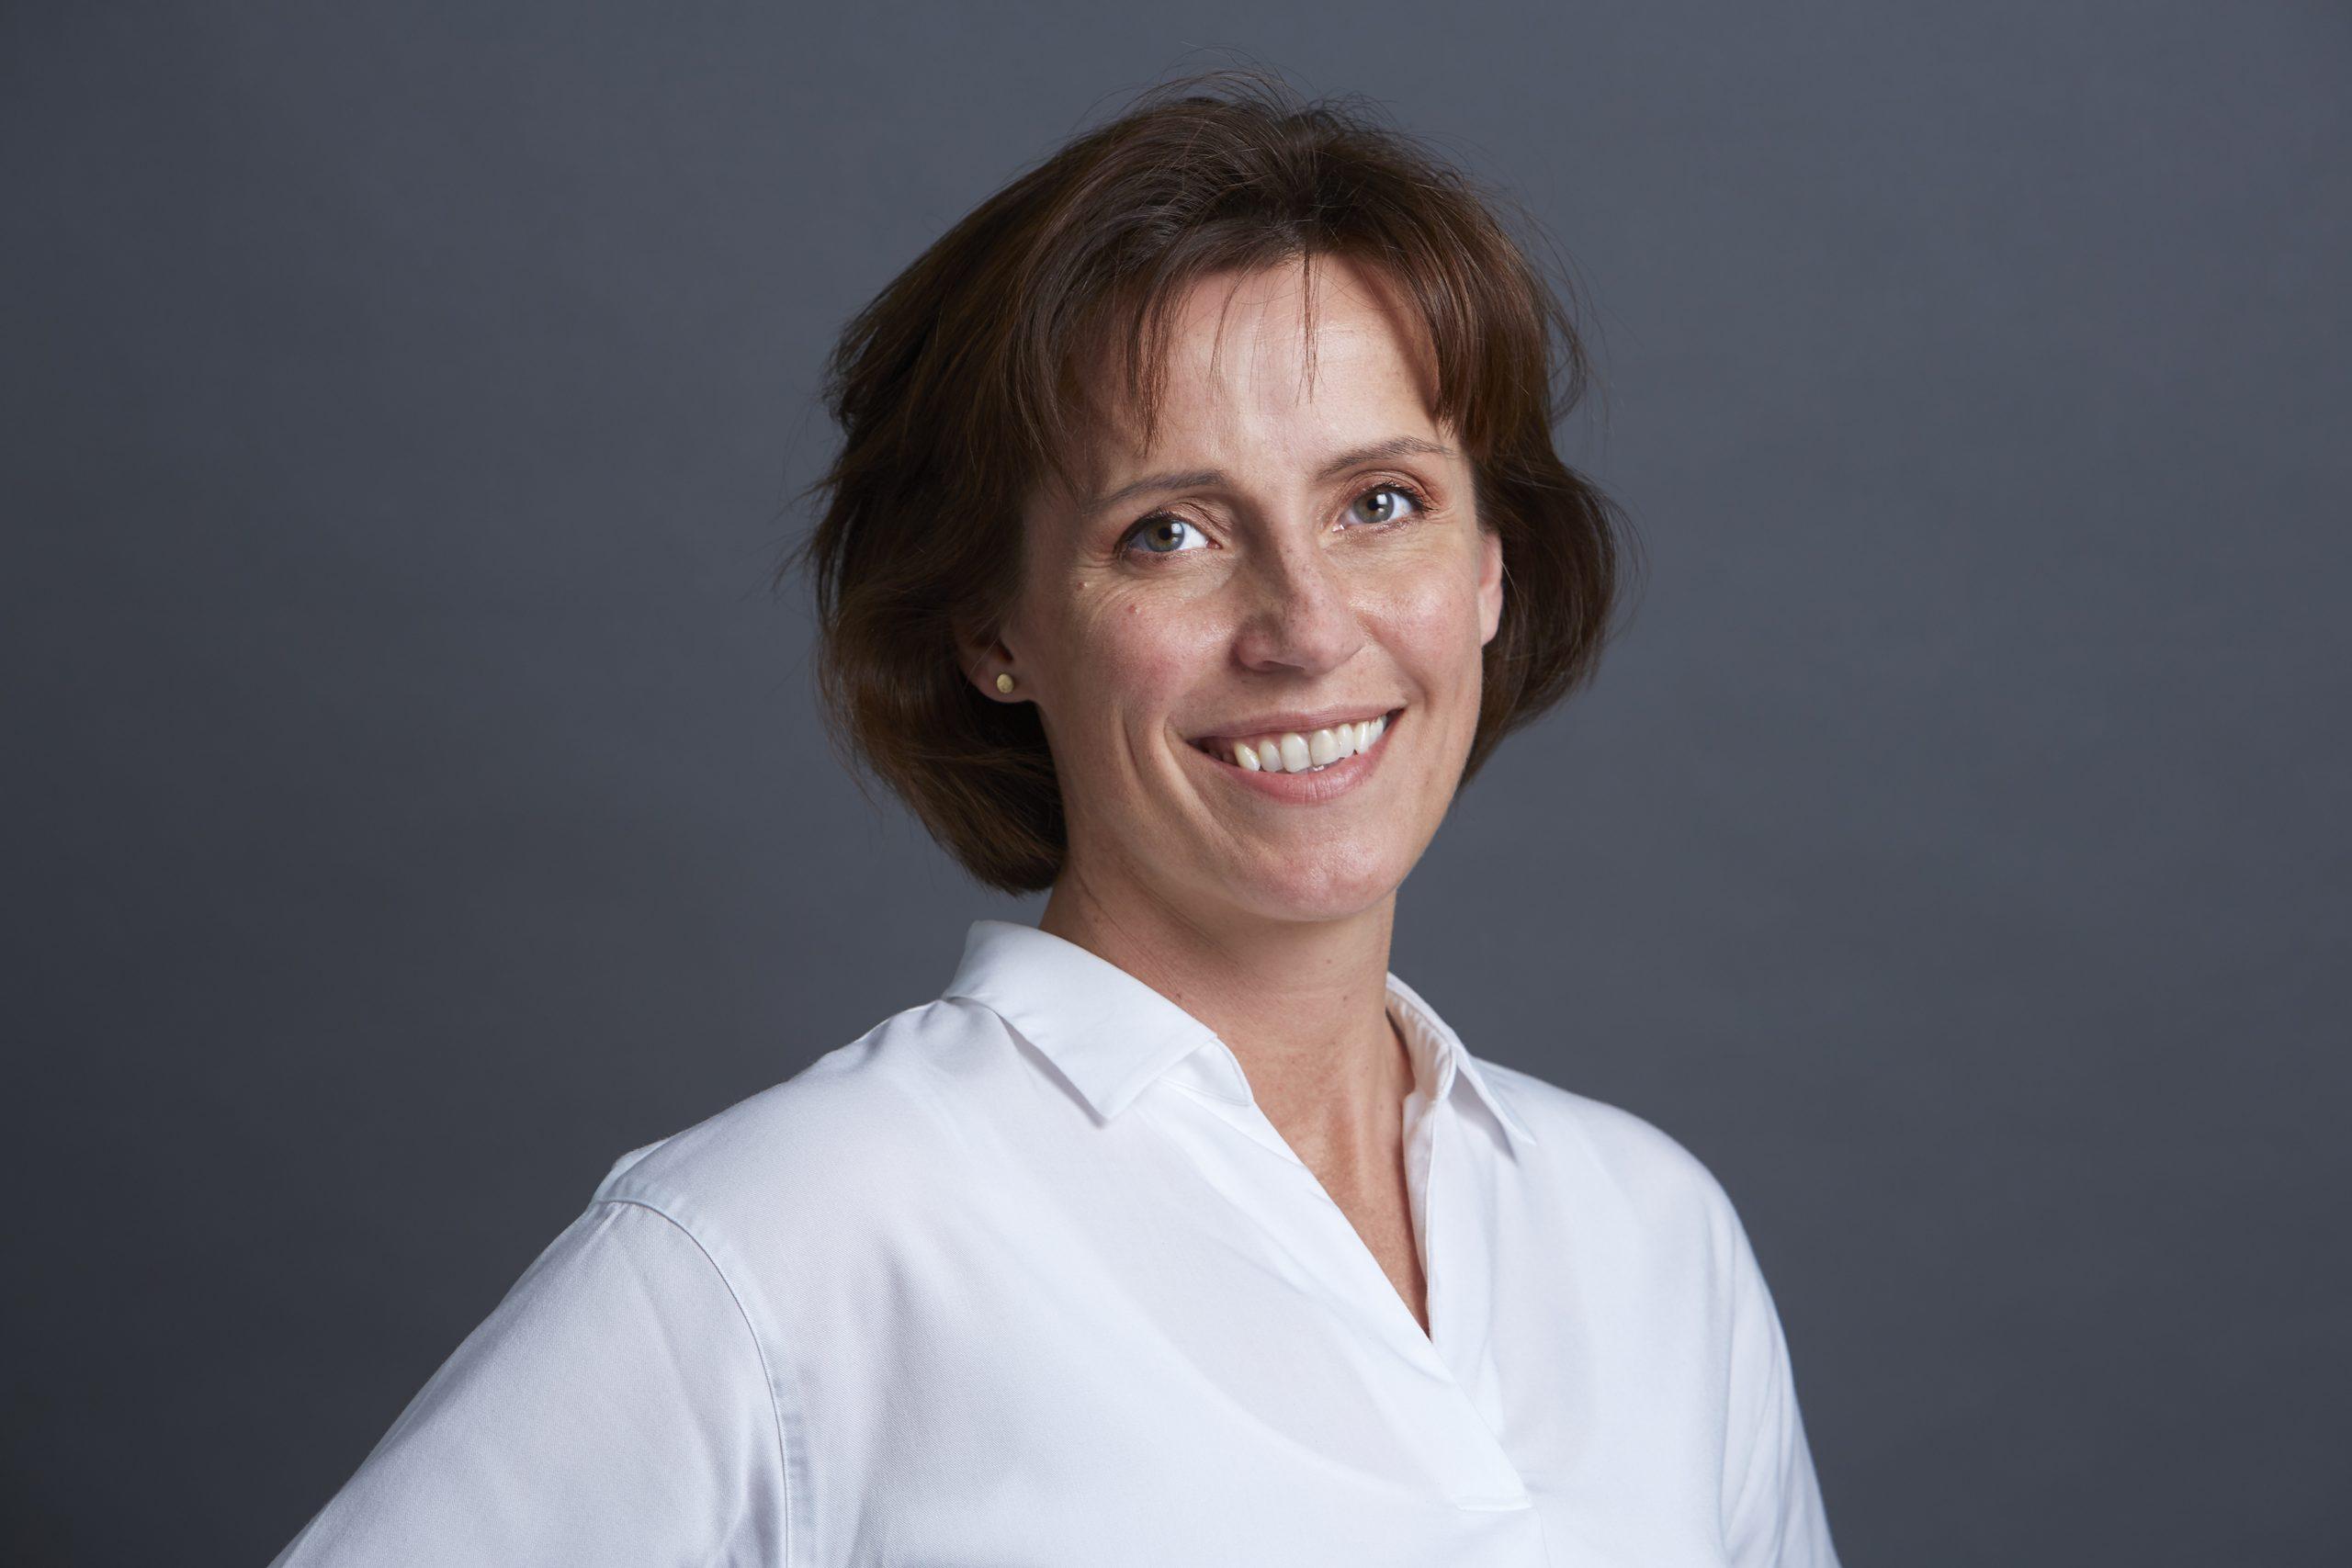 Celeste_Porsbjerg_ALR0244